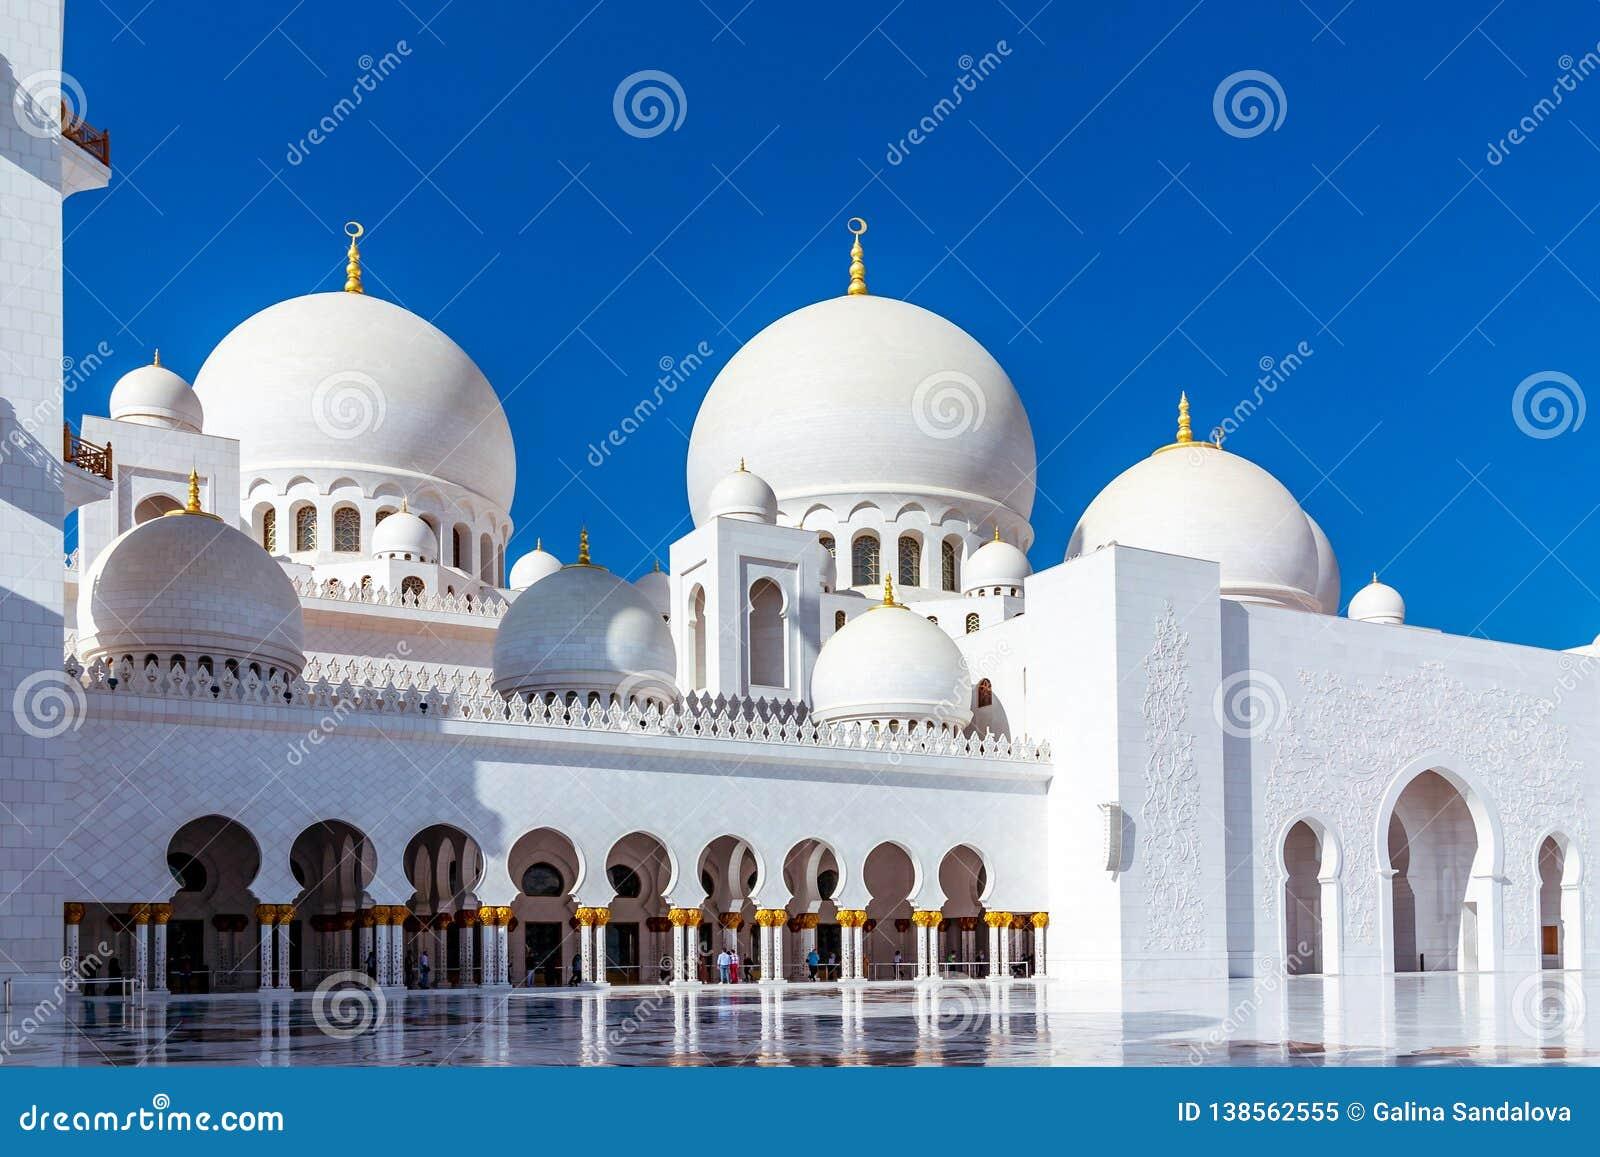 Abu Dhabi, United Arab Emirates - December 13, 2018: Famous Sheikh Zayed grand mosque in Abu Dhabi, United Arab Emirates